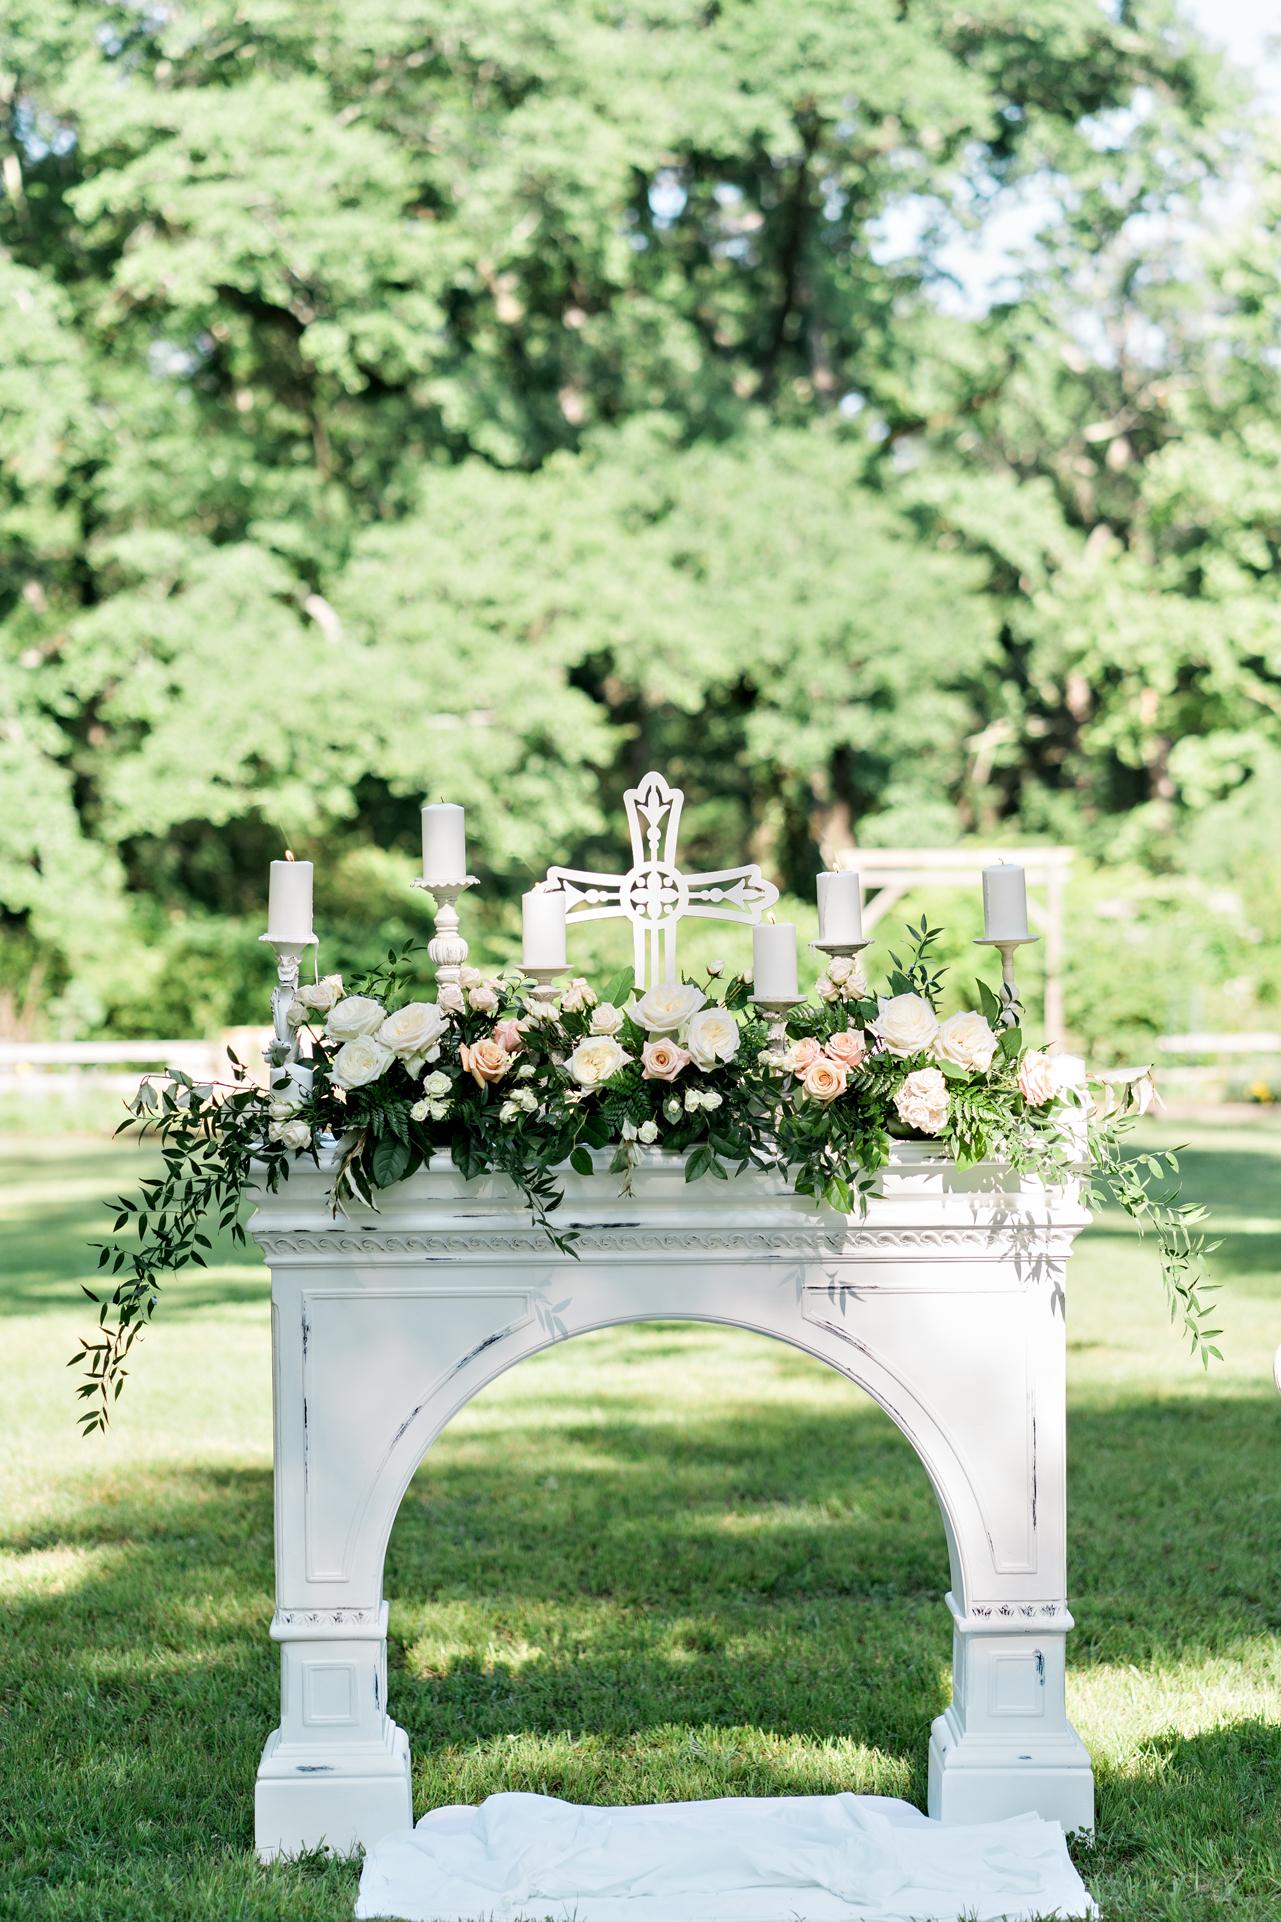 Alabama-Photographers-Nick-Drollette-Wedding-Photography-133.jpg